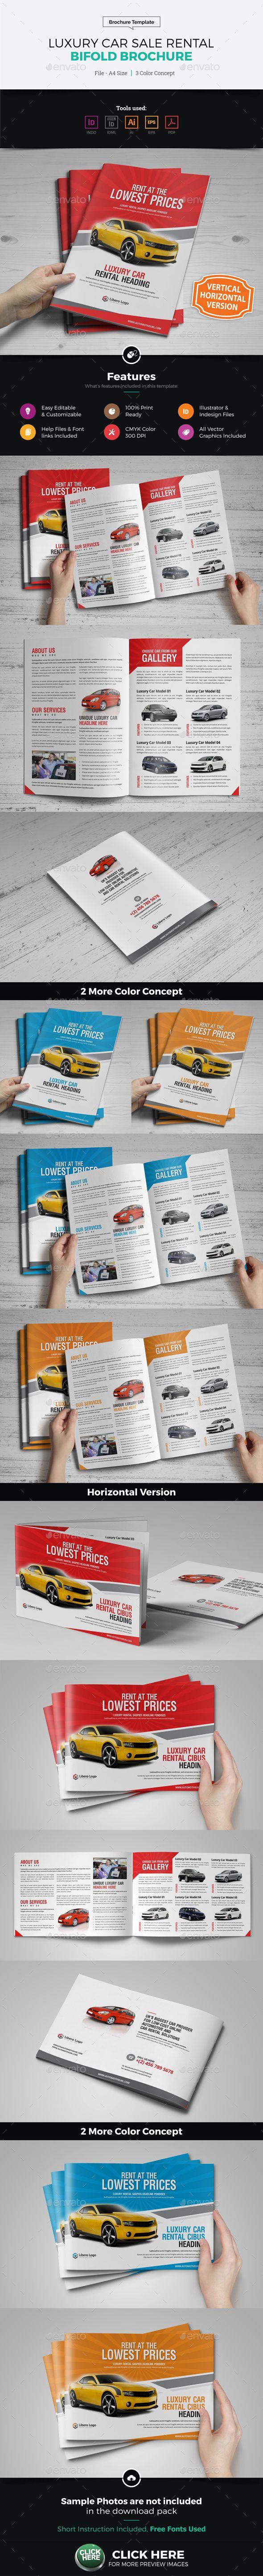 Luxury Car Sale Rental A4 Brochure Design Template Vector EPS, InDesign INDD, AI Illustrator